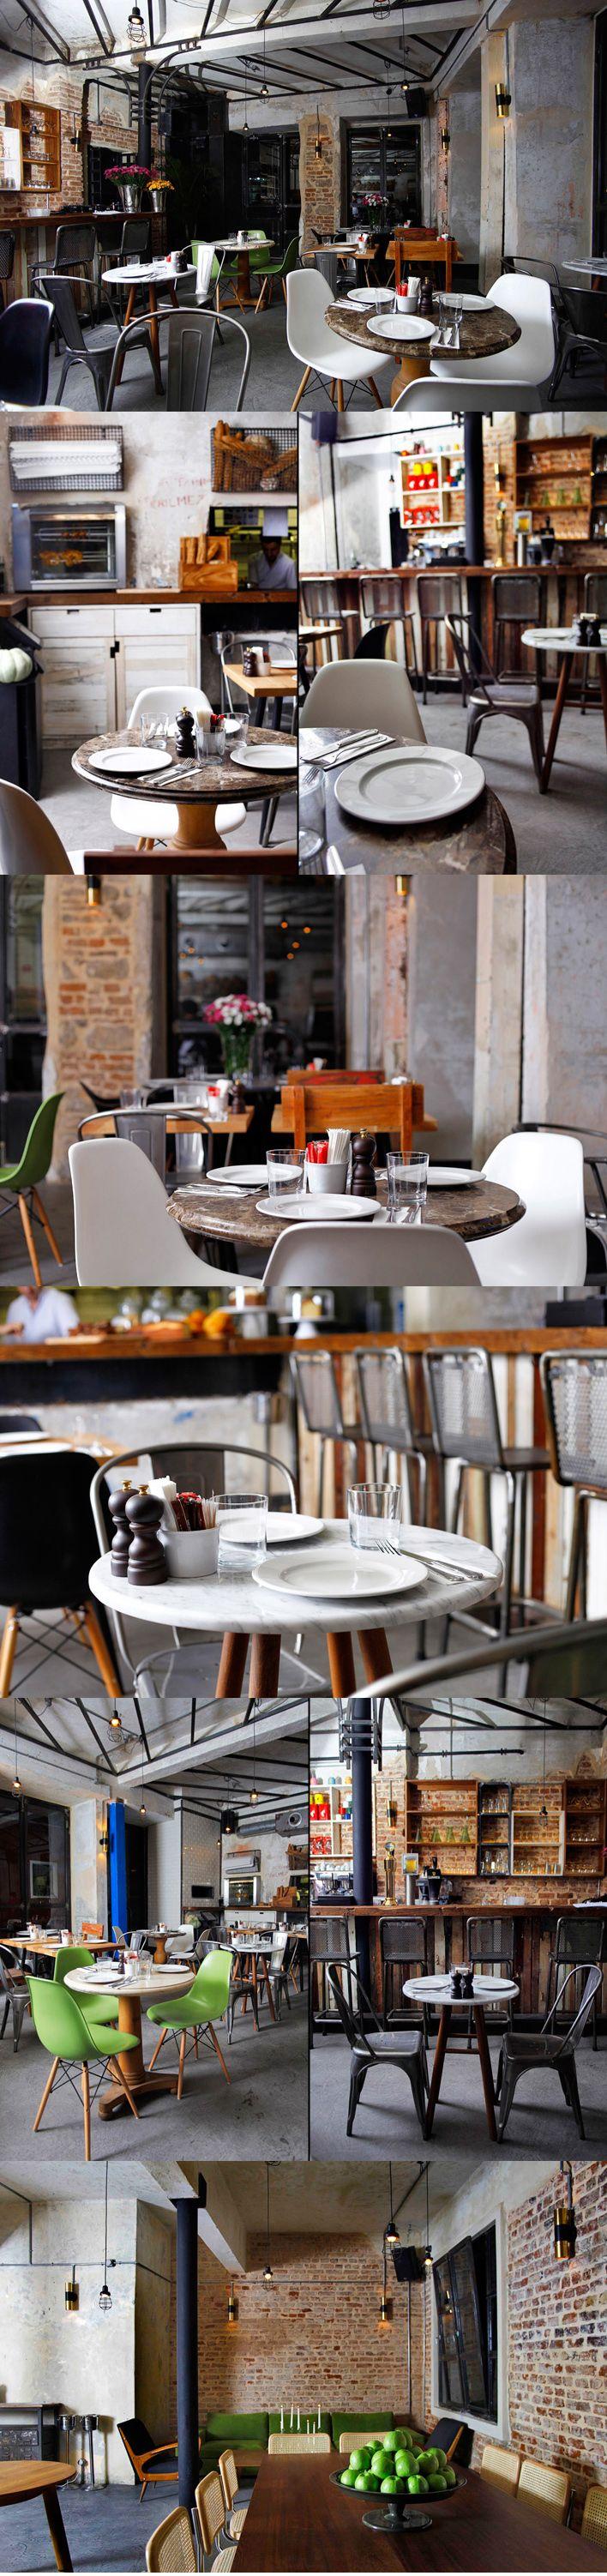 Unter restaurant cafe Istanbul